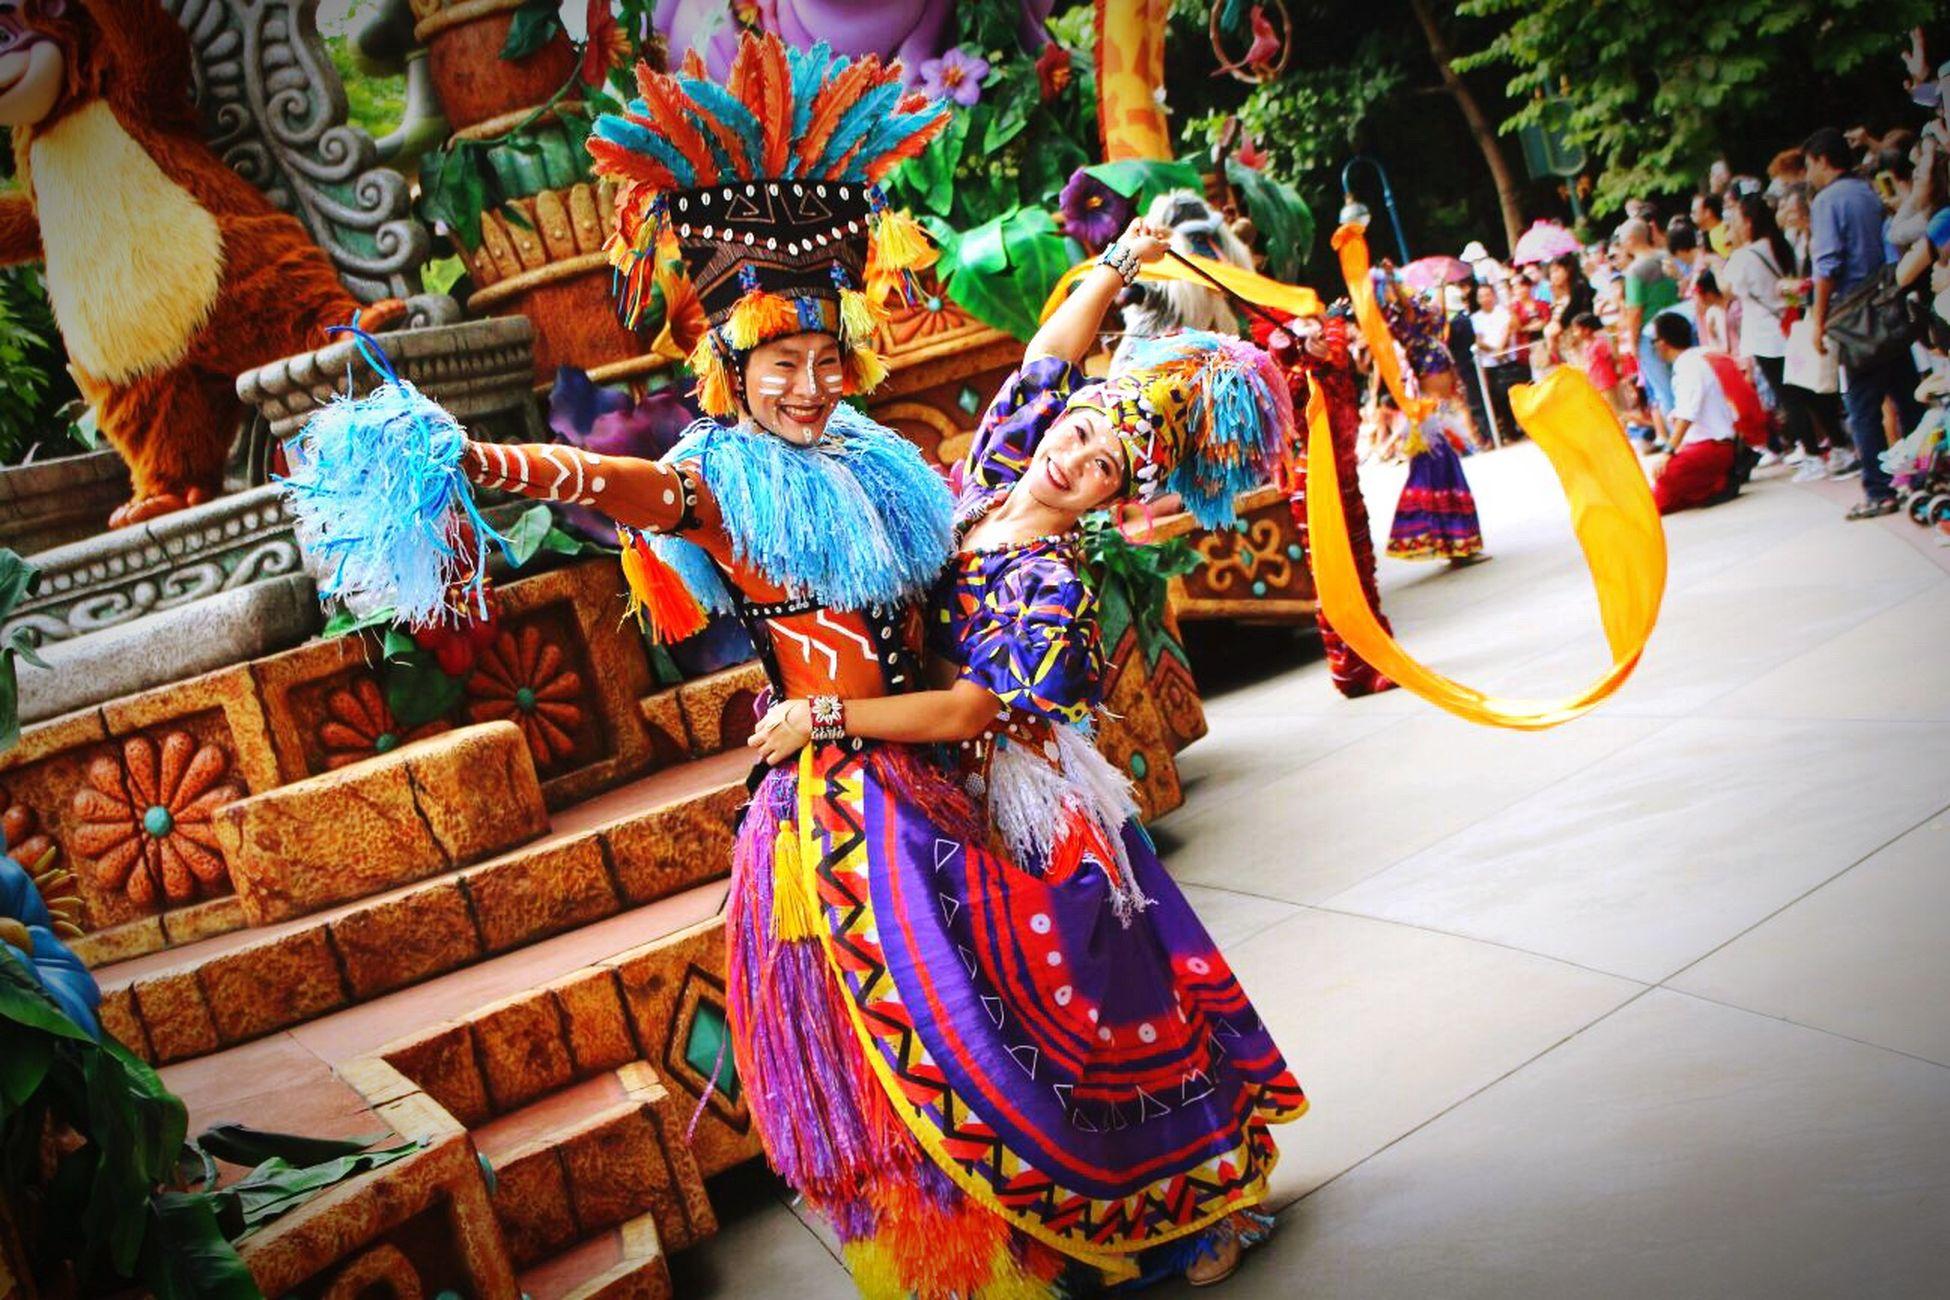 I love dance with you,my しば犬😘😘😘 Hongkong Disneyland At Hong Kong Disneyland 香港迪士尼樂園 Parade Dancer That's Me Parade Dancer